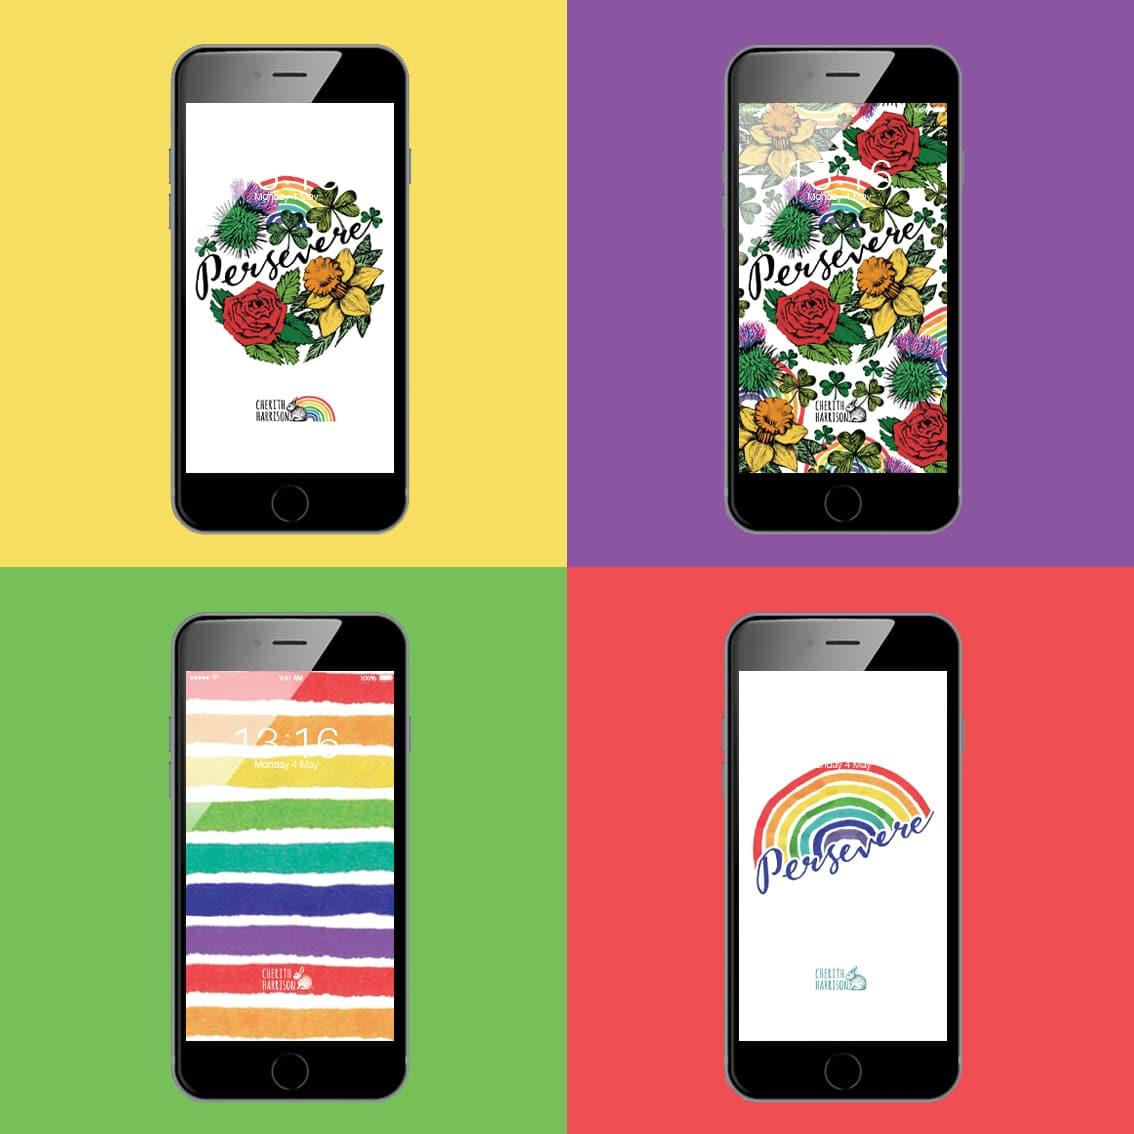 Rainbow screen savers by Cherith Harrison